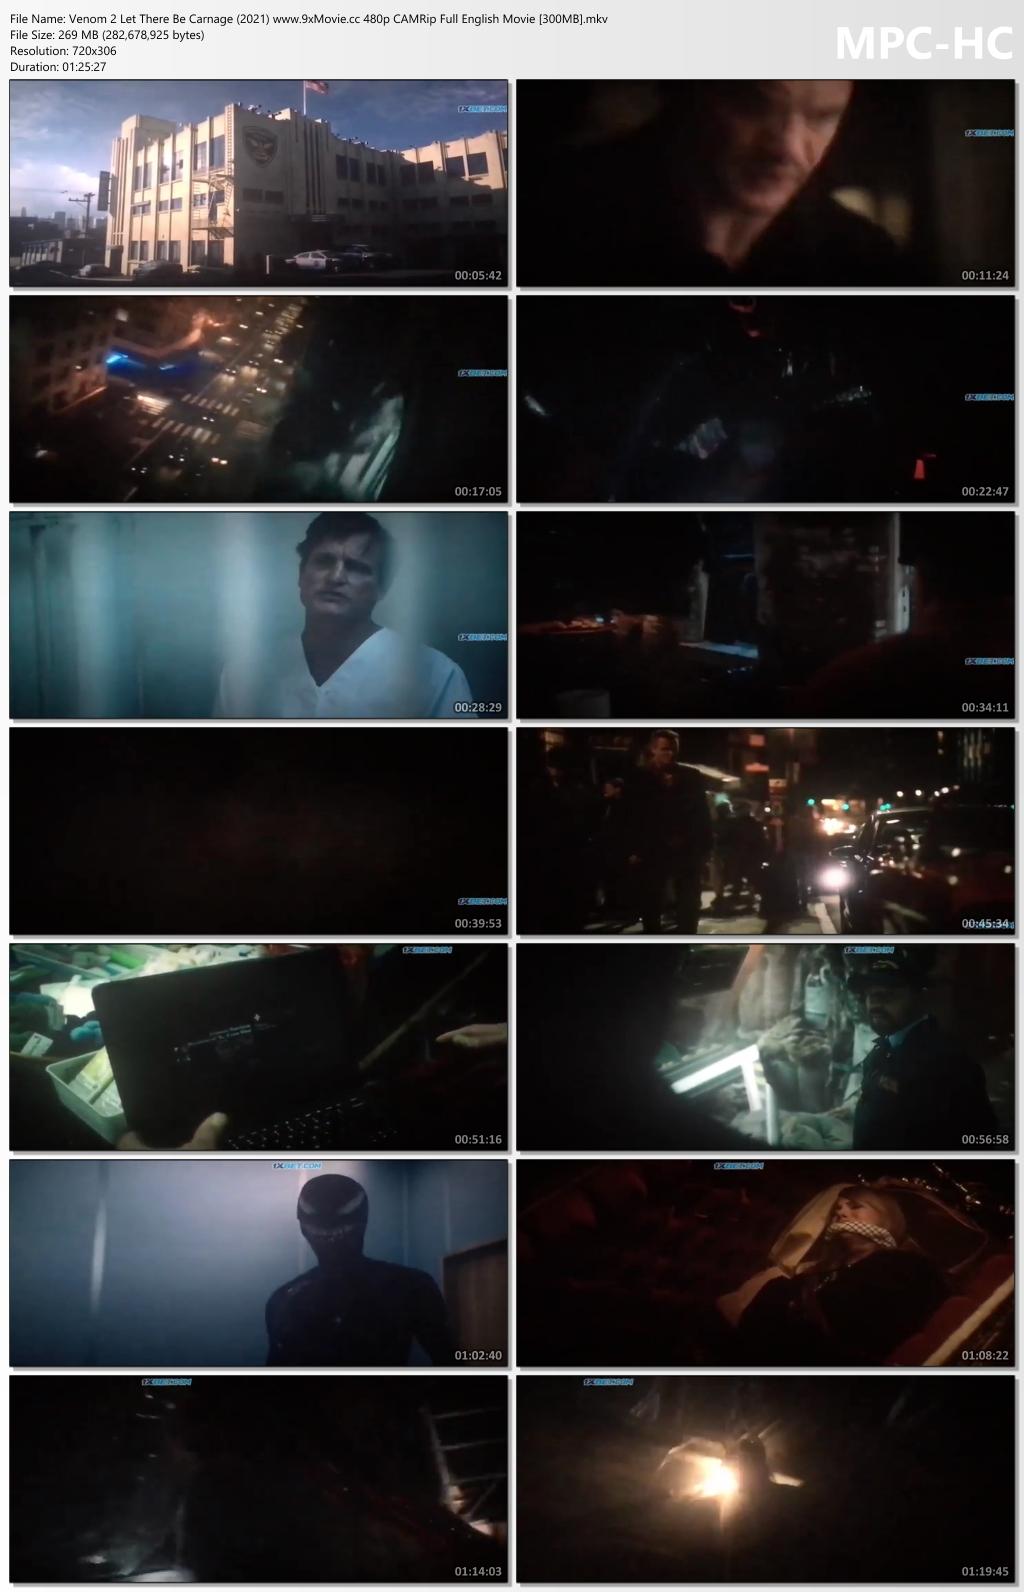 Venom-2-Let-There-Be-Carnage-2021-www-9x-Movie-cc-480p-CAMRip-Full-English-Movie-300-MB-mkv